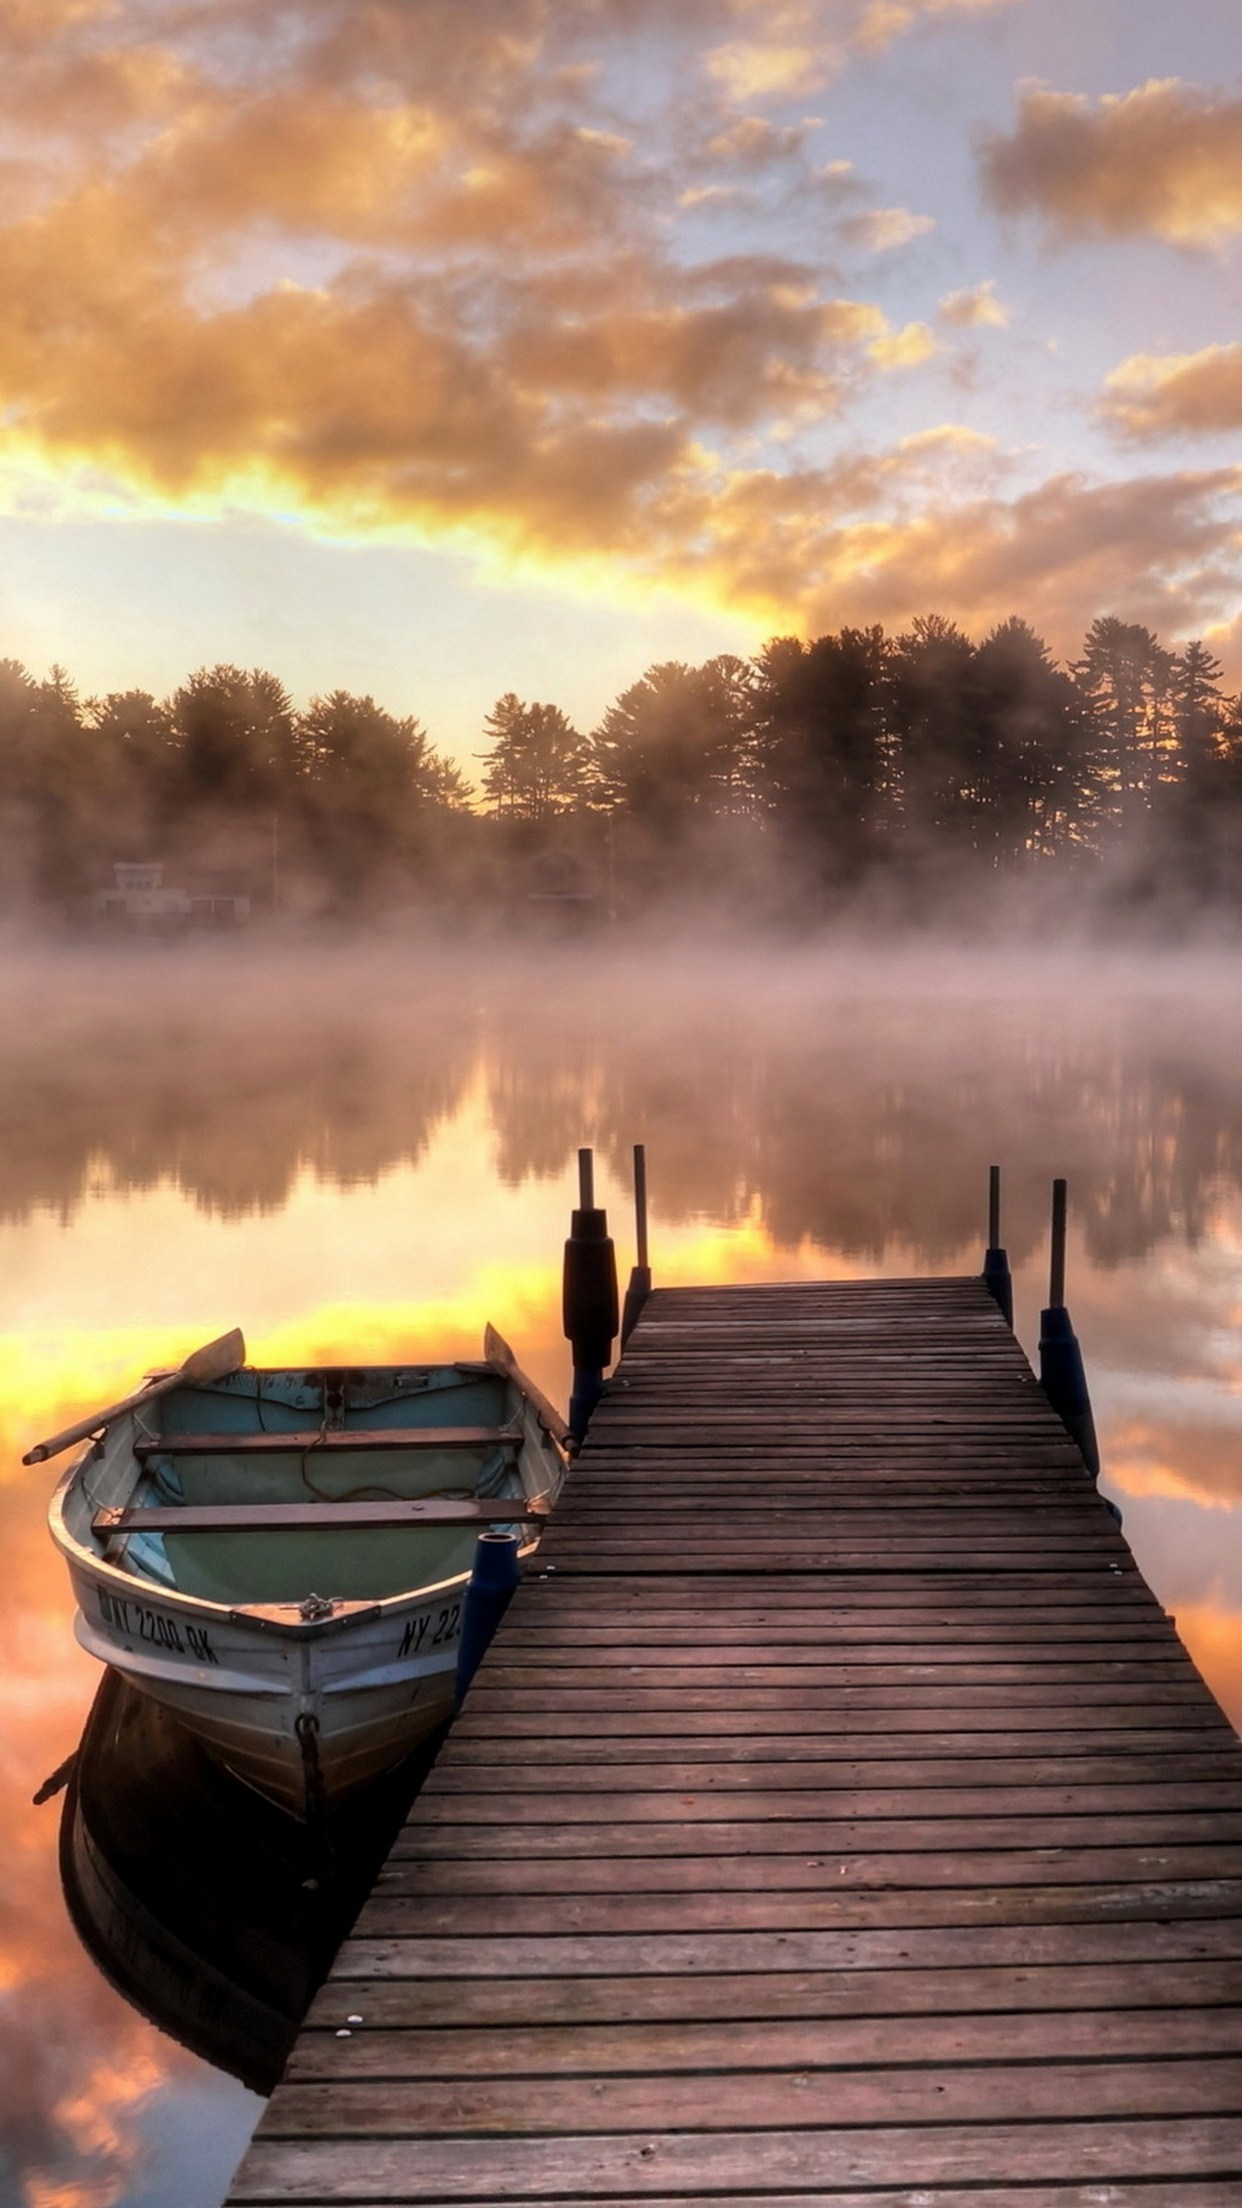 Boat Bridge Wallpaper For Iphone X 8 7 6 Free Download